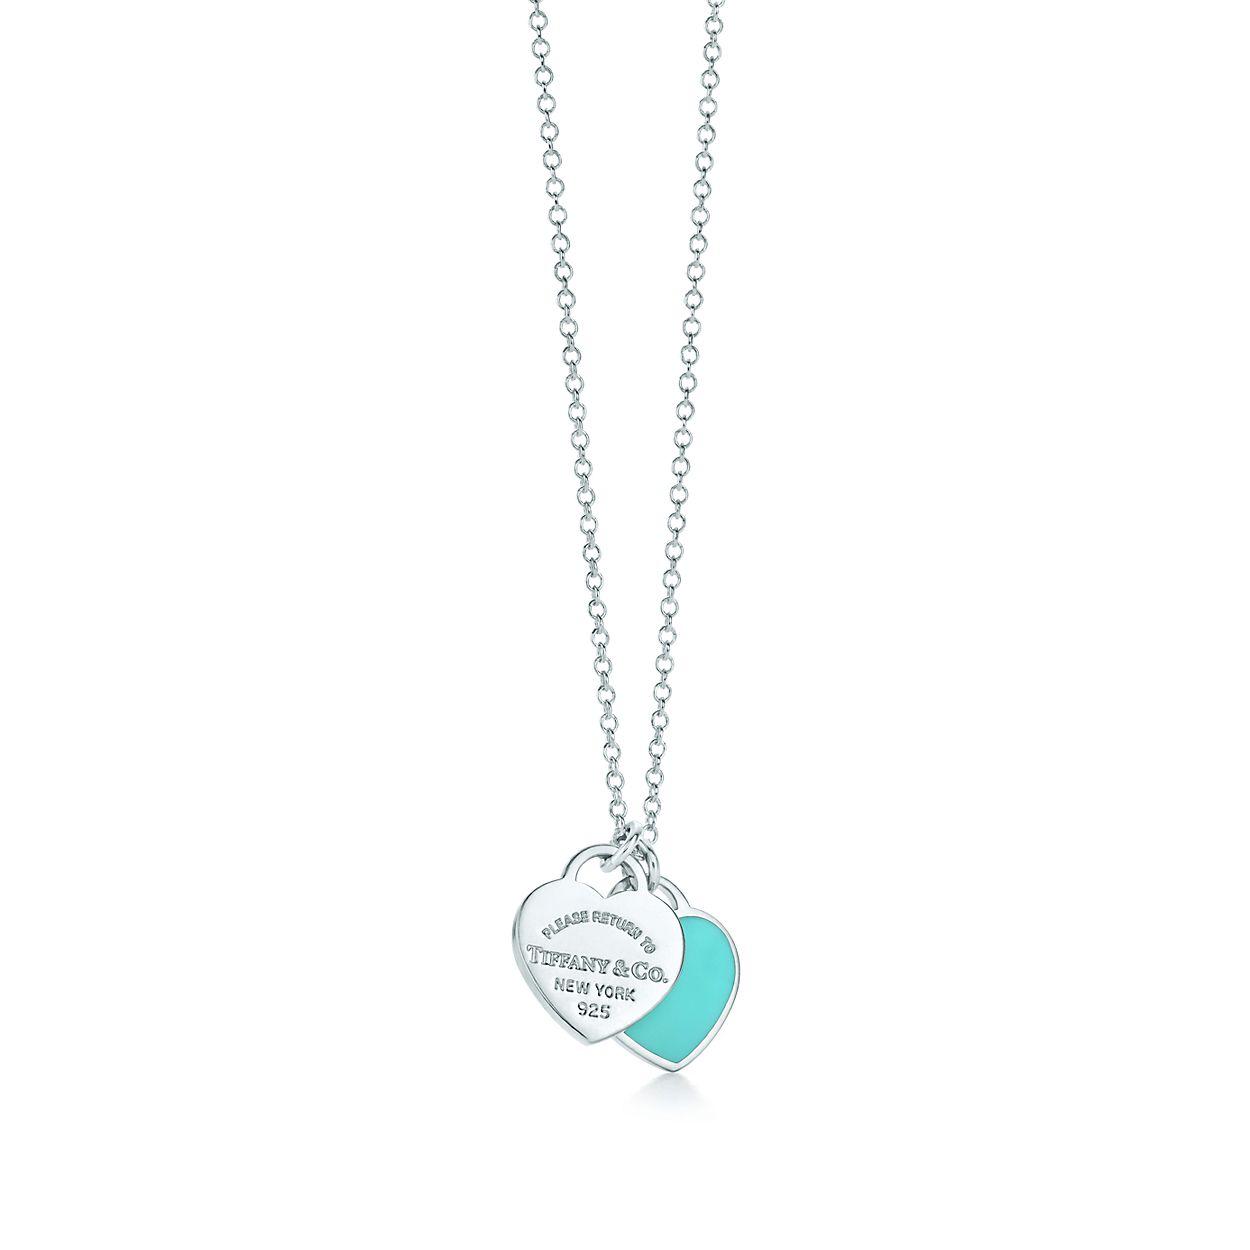 48e593804 Return to Tiffany™ mini double heart tag pendant in silver with ...